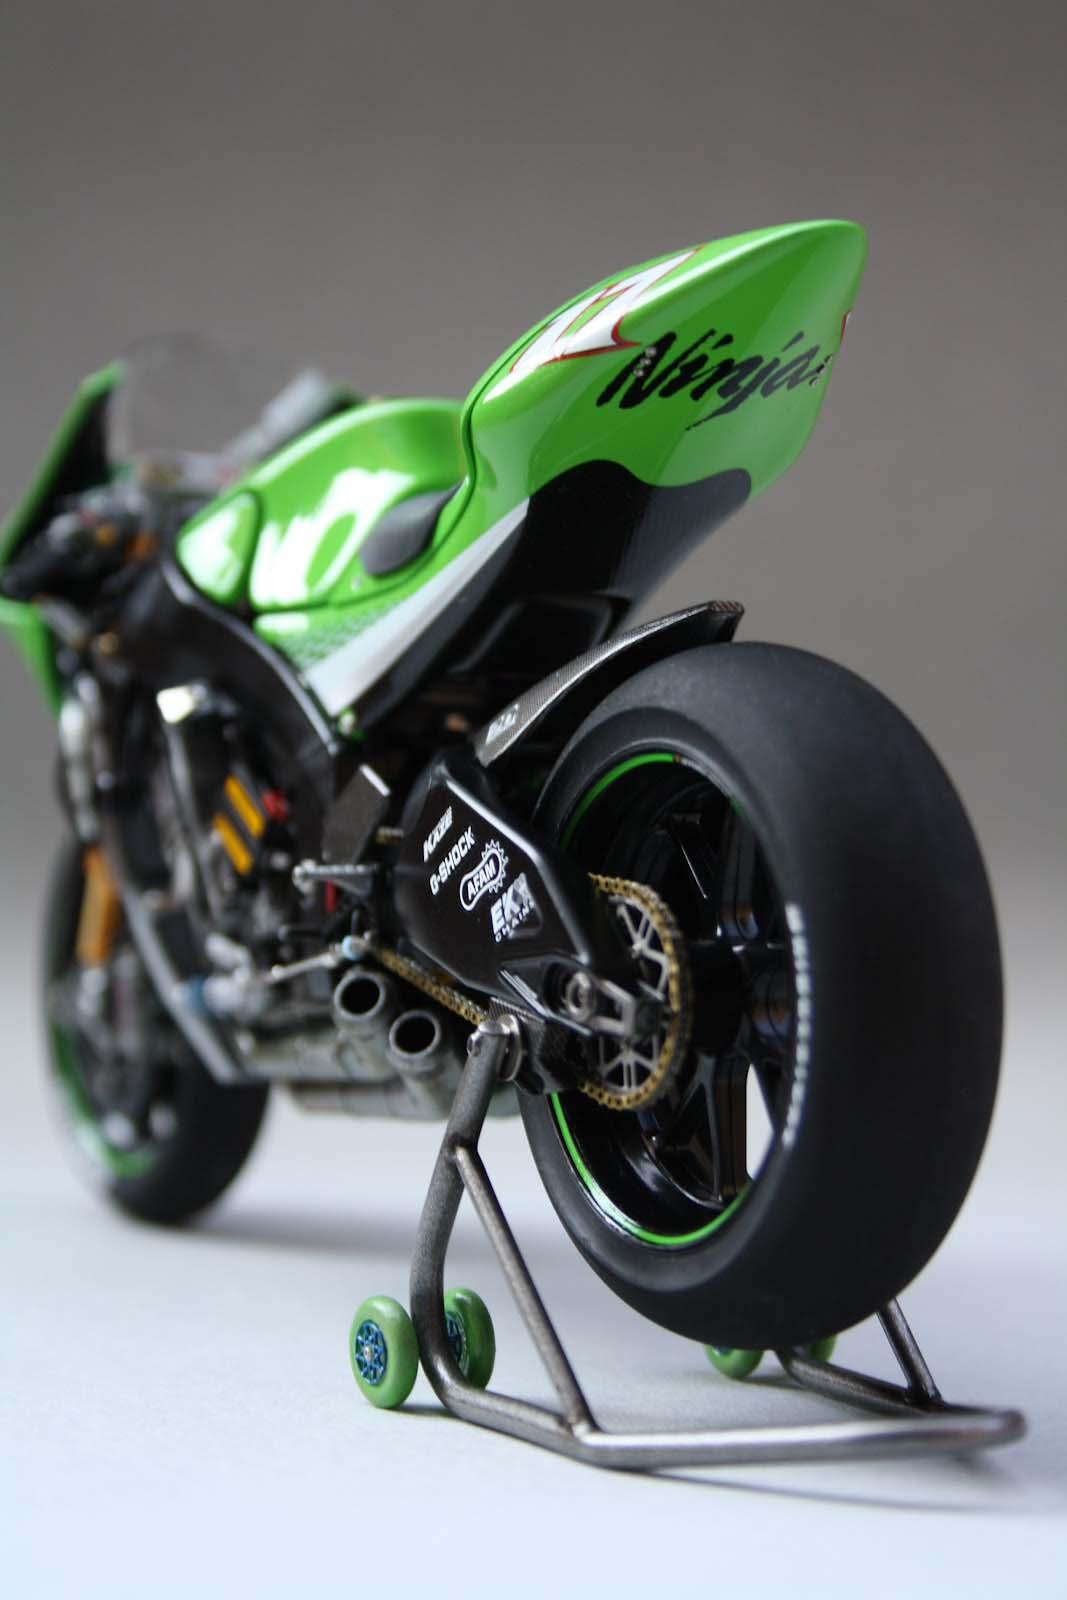 XXX: Randy de Puniet's 2006 Kawasaki Ninja ZX-RR - Asphalt & Rubber